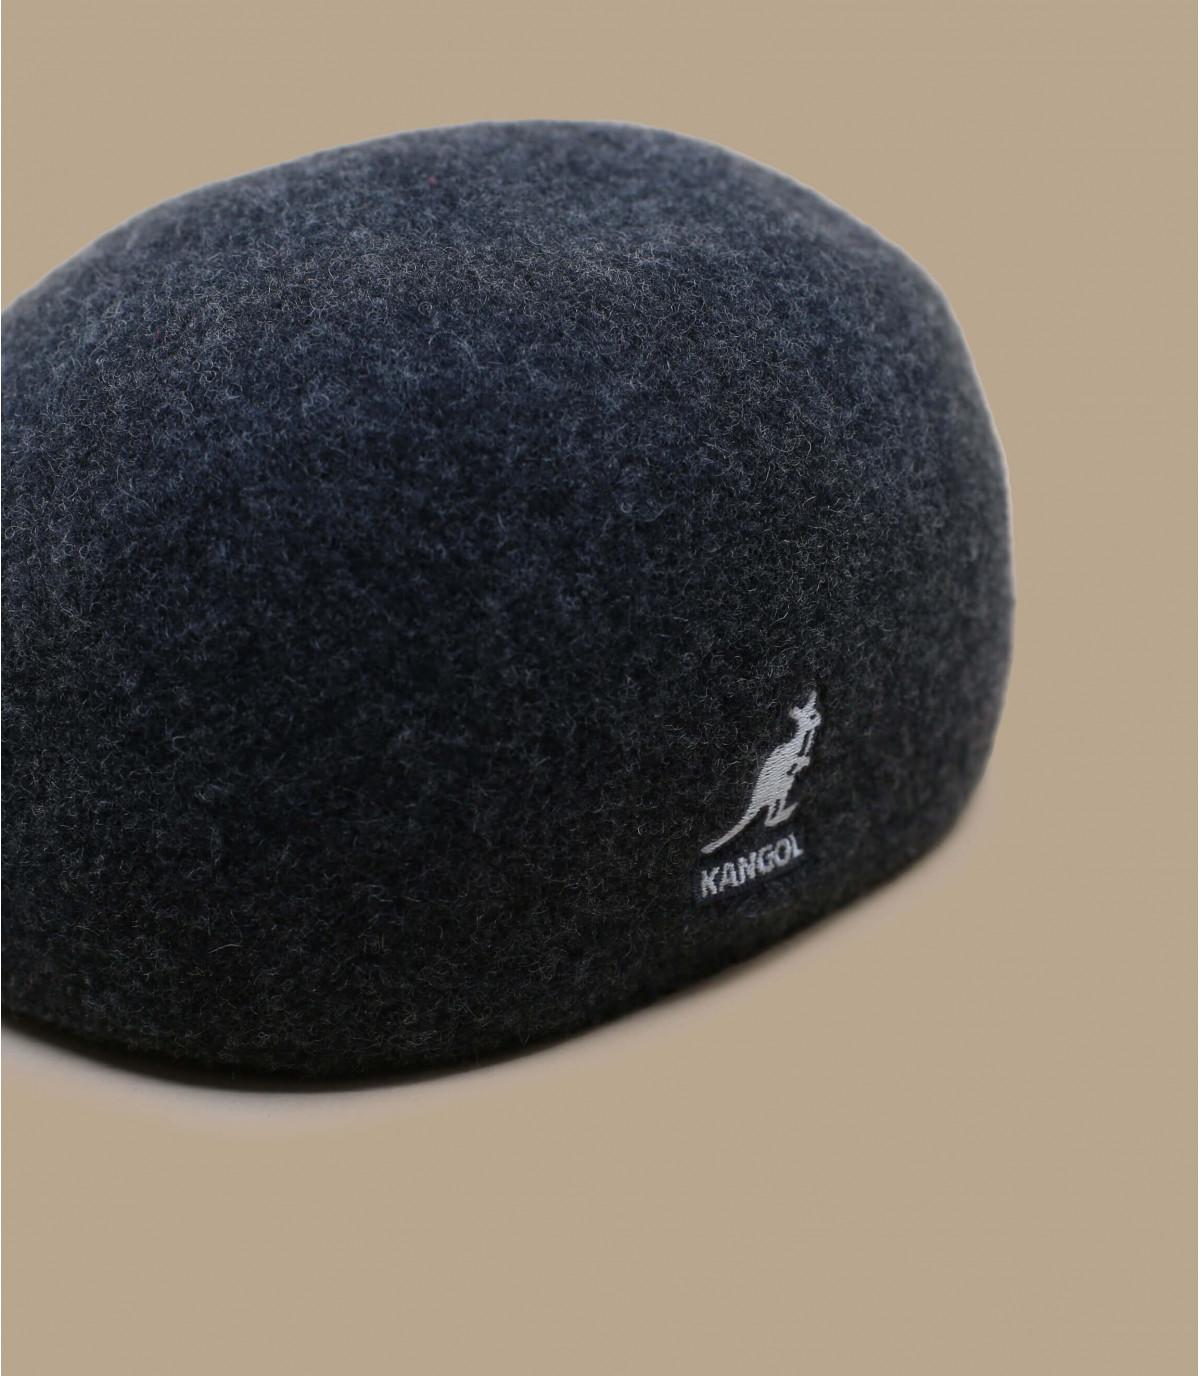 Détails Seamless Wool 507 dk flannel - image 3